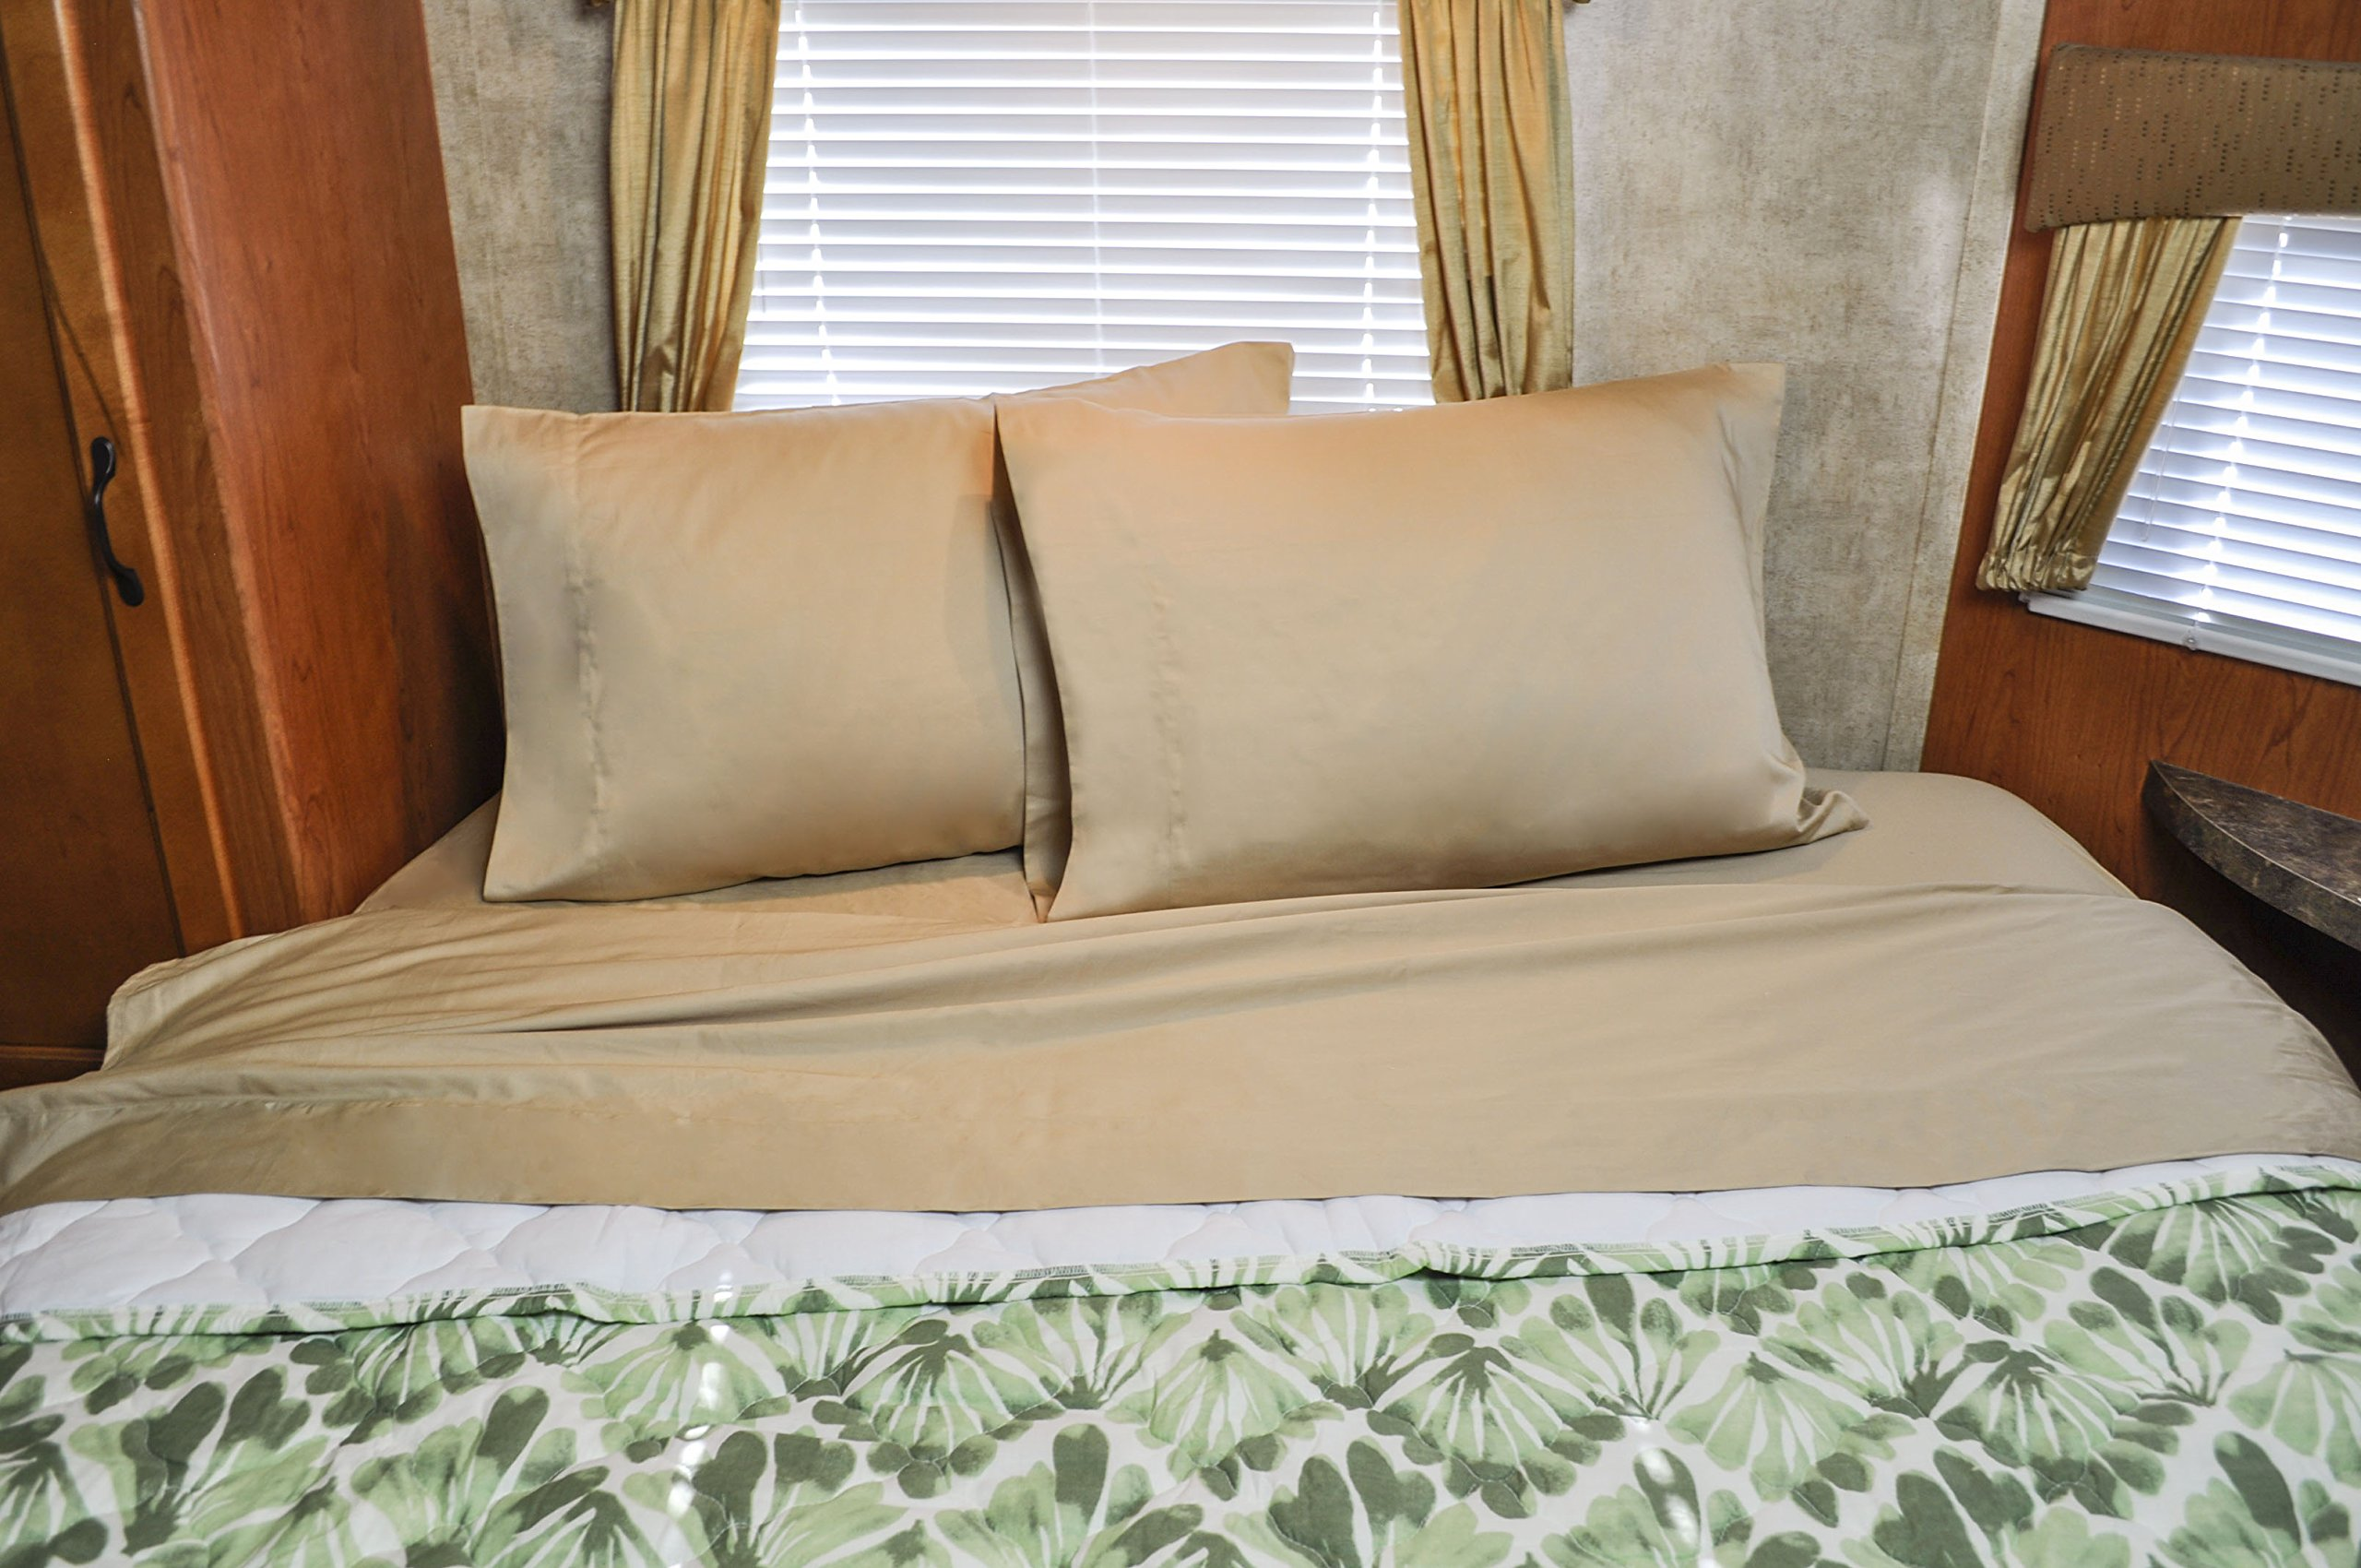 AB Lifestyles Short Queen Camper RV Sheet Set 100% cotton featuring NoTuck Top Sheet design! Color: Camel